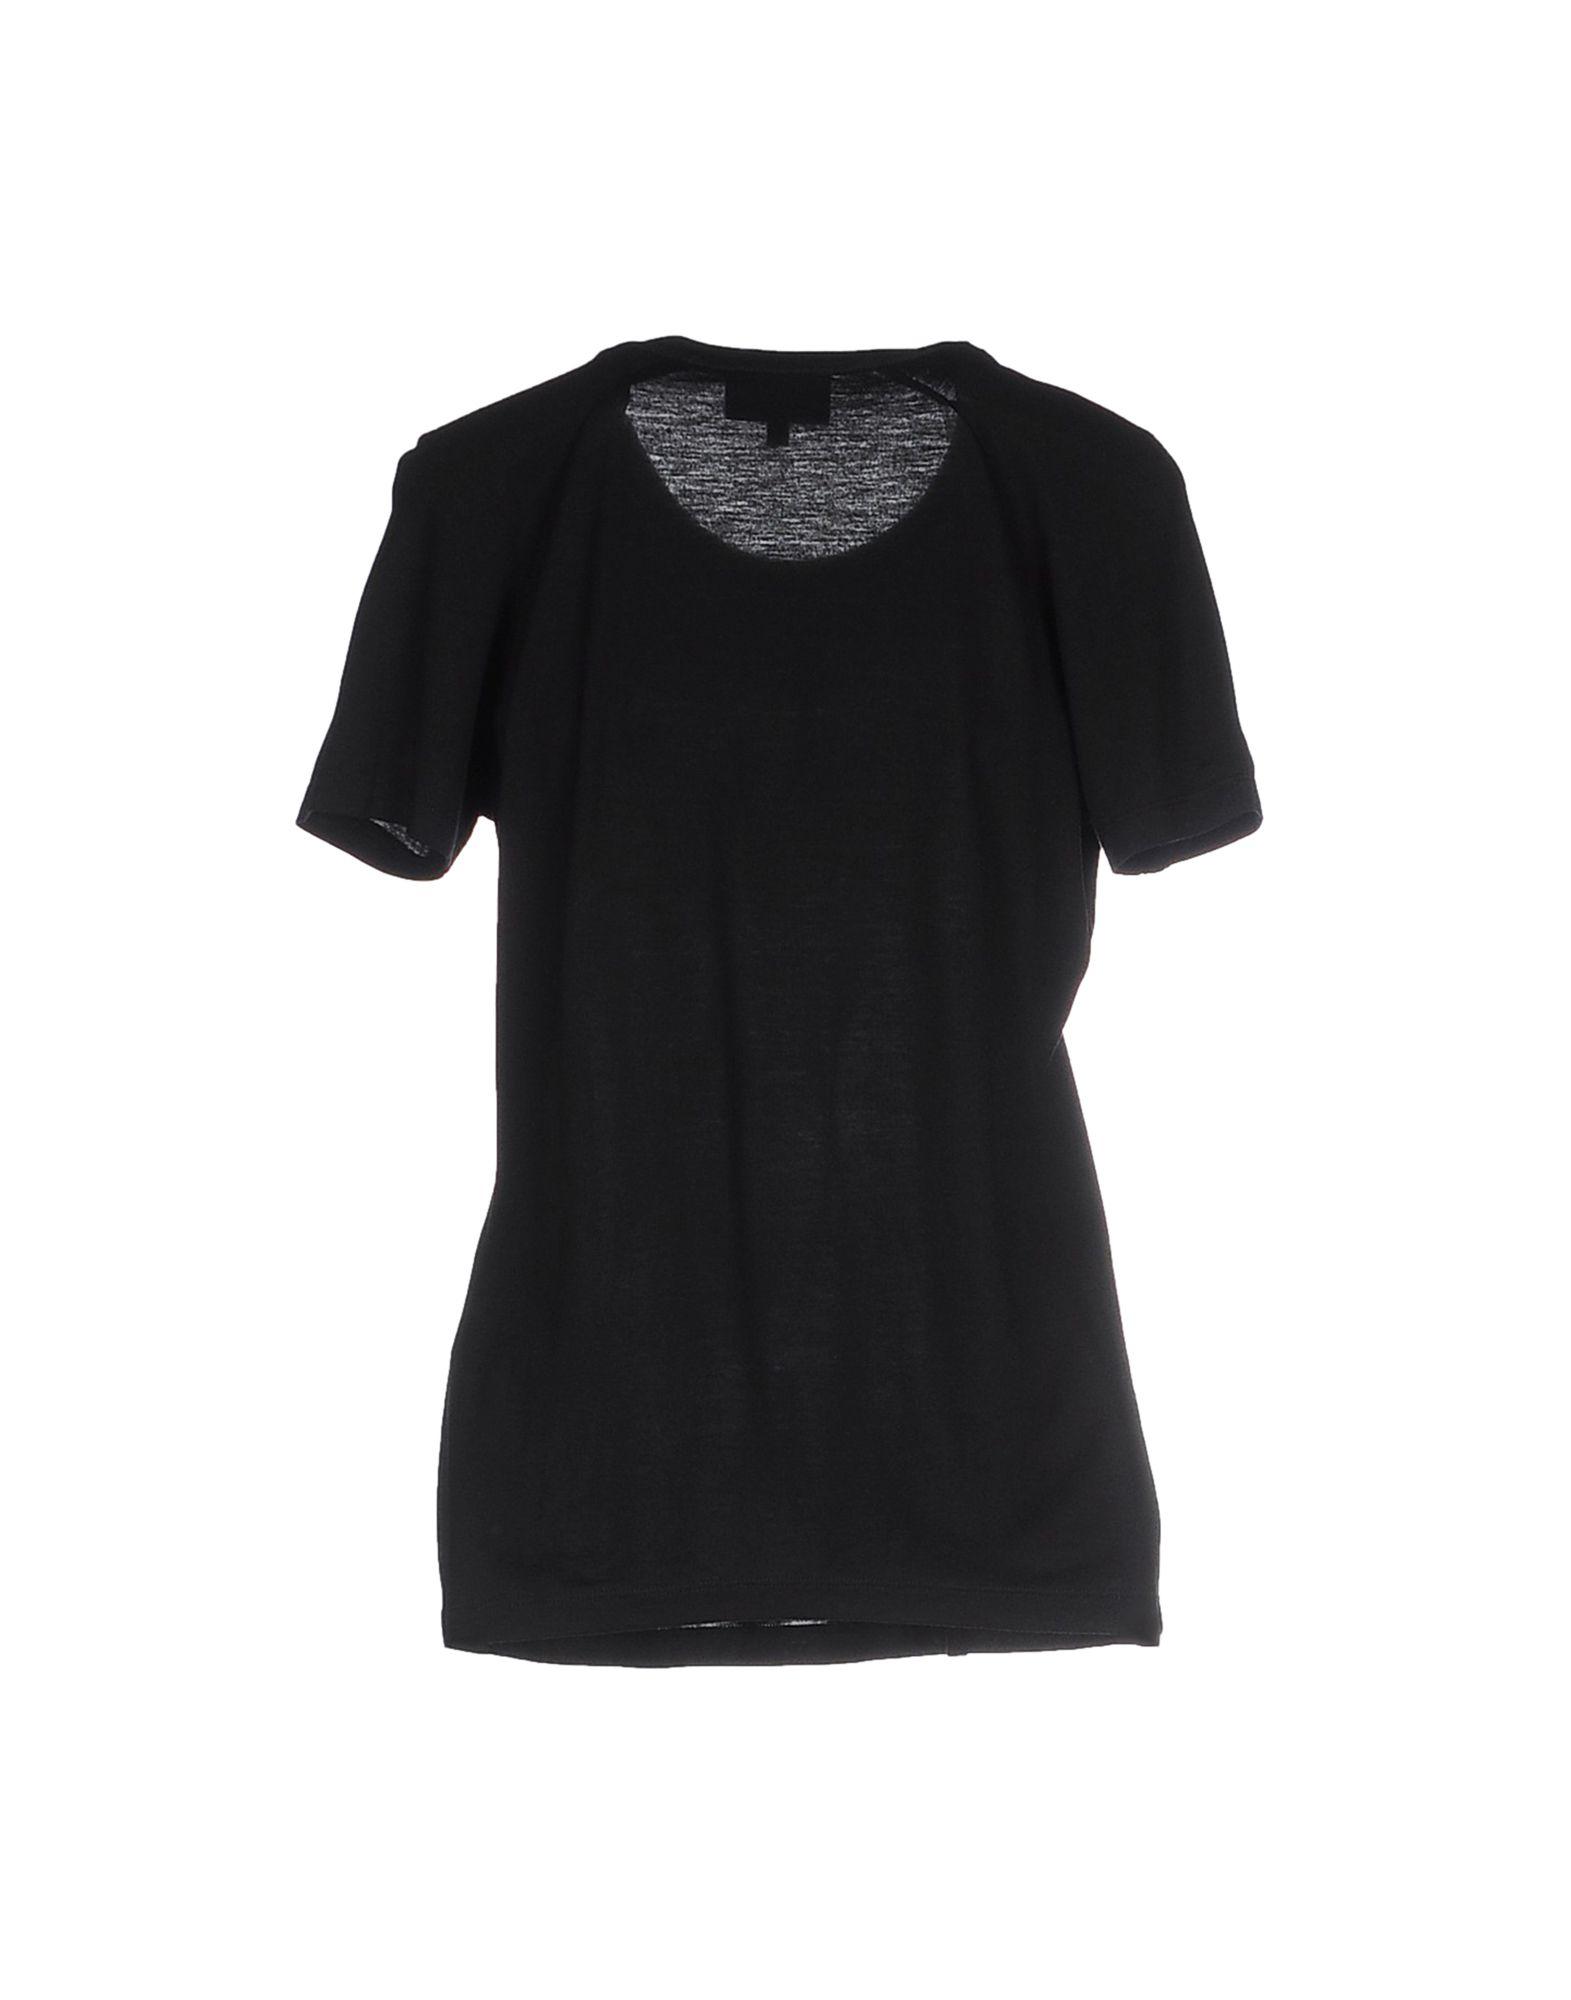 Emporio Armani T Shirt In Black Lyst